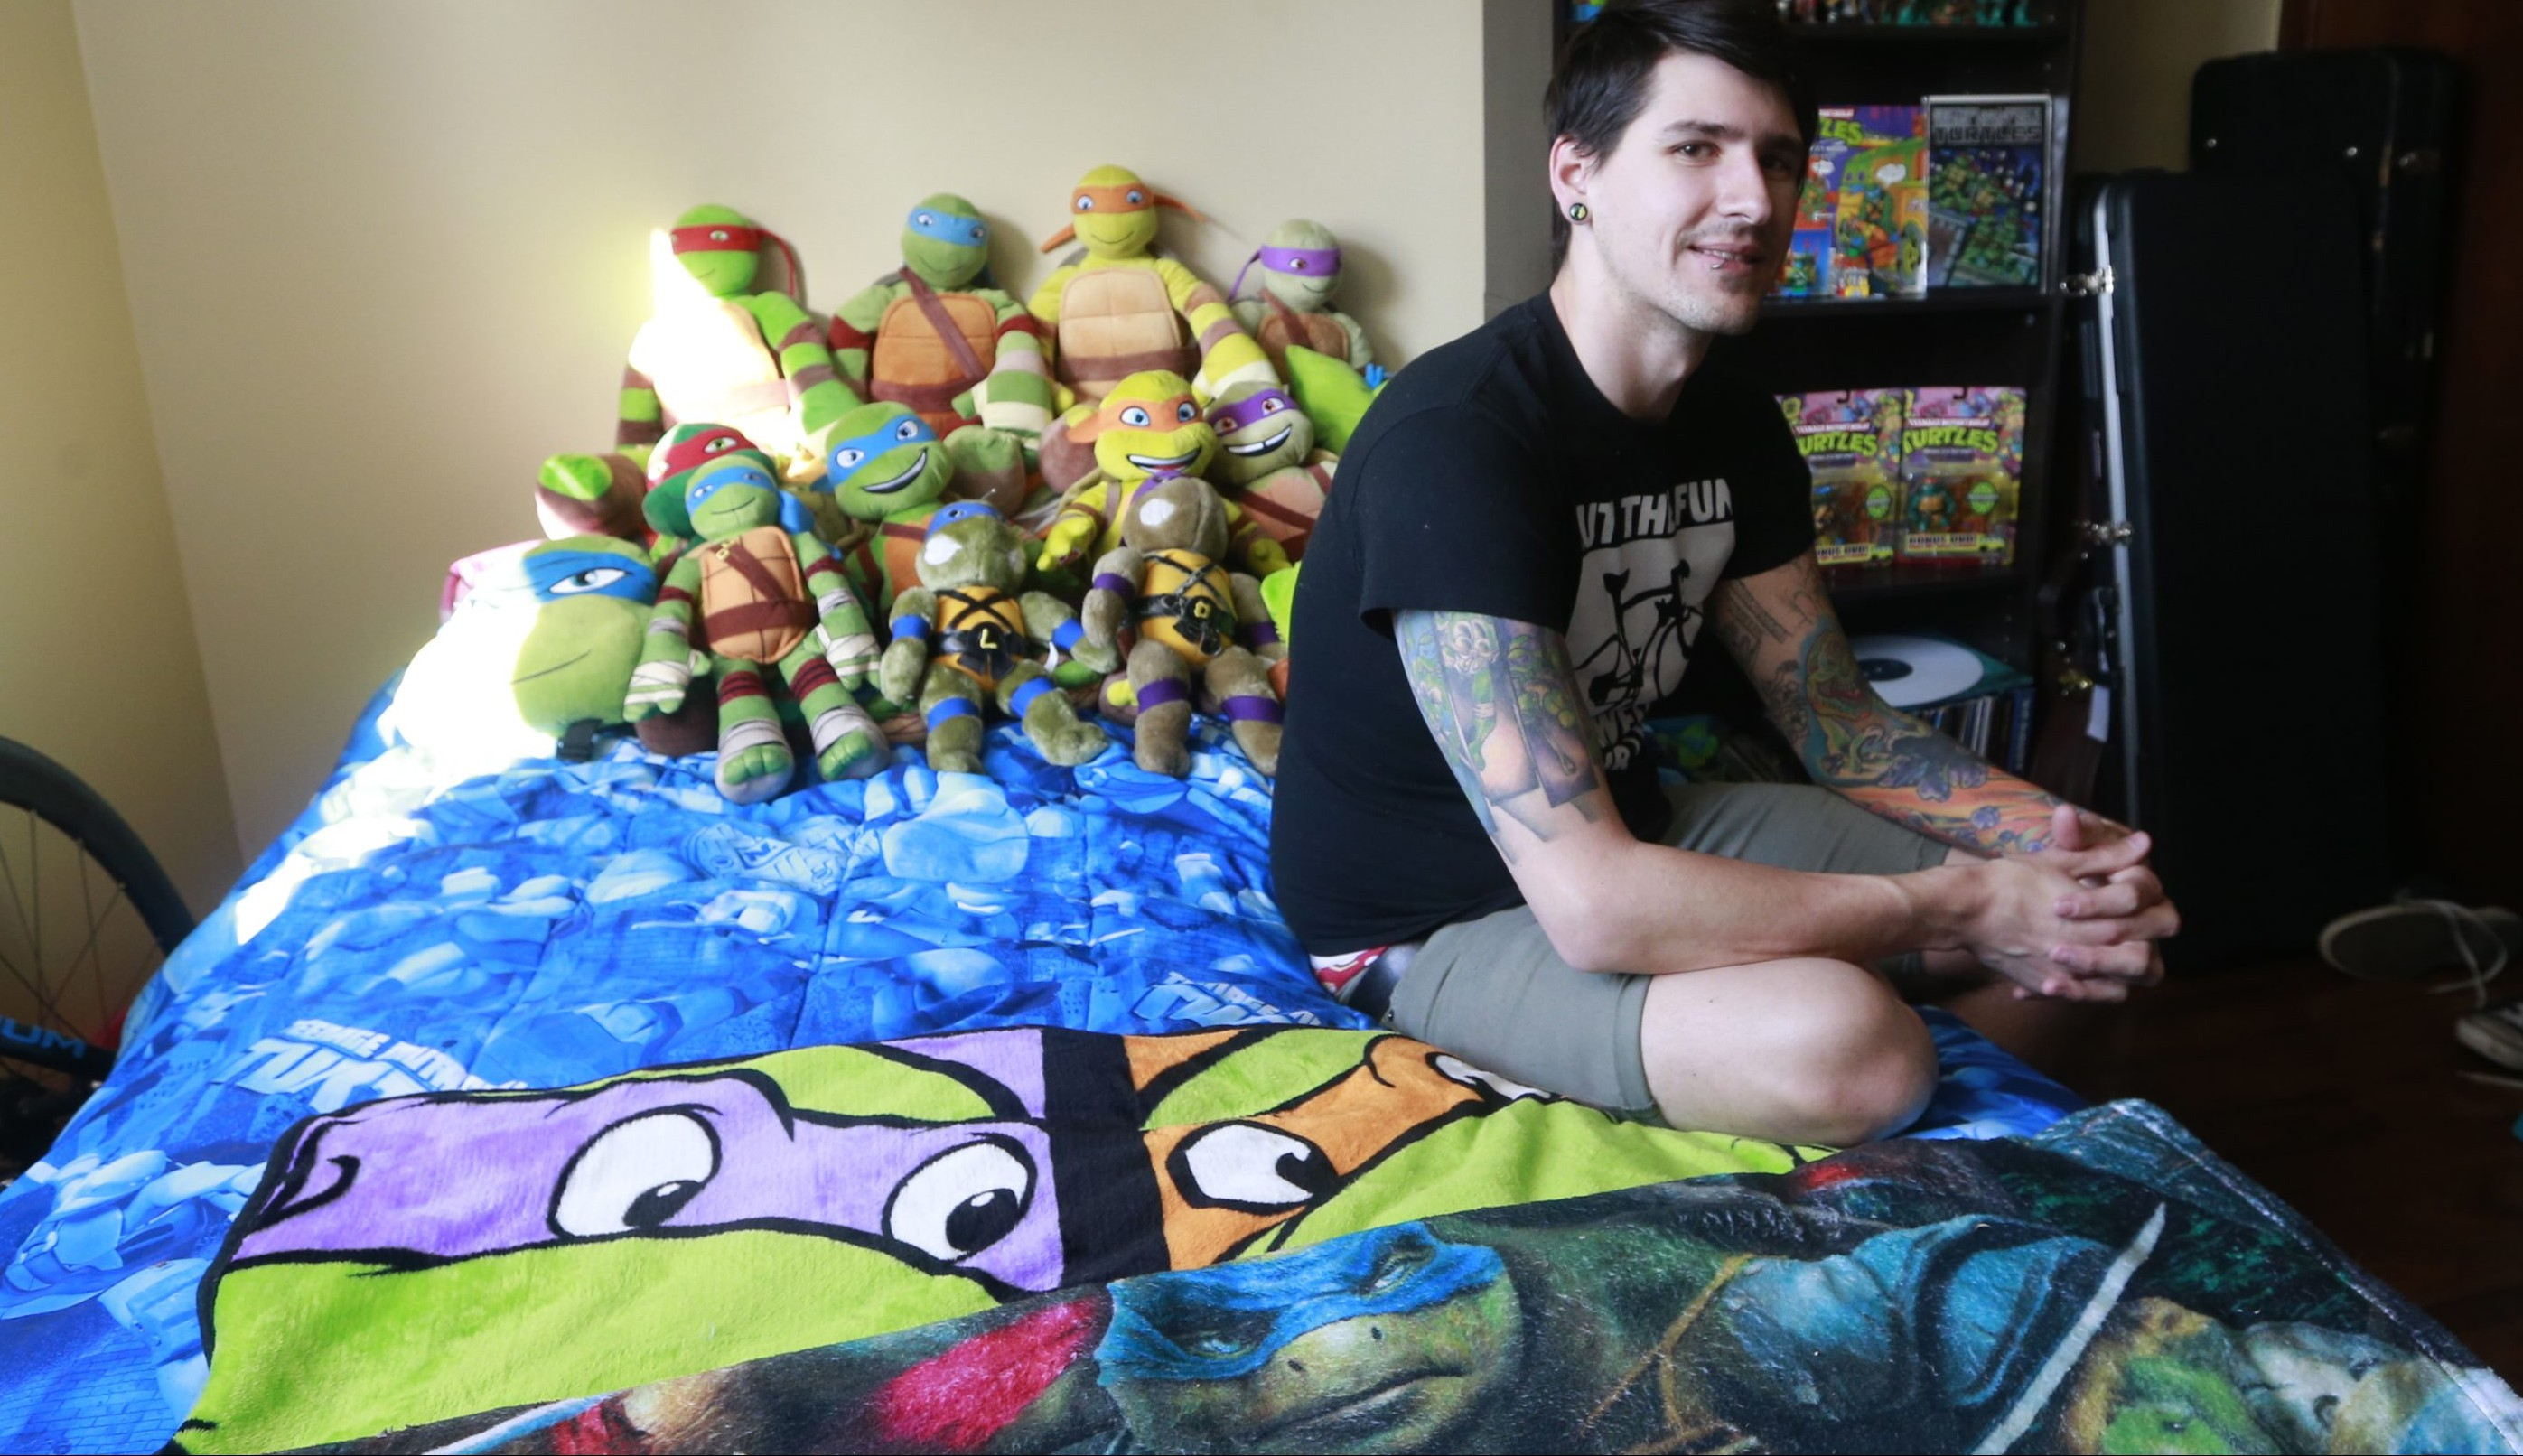 Joseph Raab of Lancaster is a big fan of the Teenage Mutant Ninja Turtles, as shown by his sleeve tattoo and his collection of Ninja Turtles memorabilia.